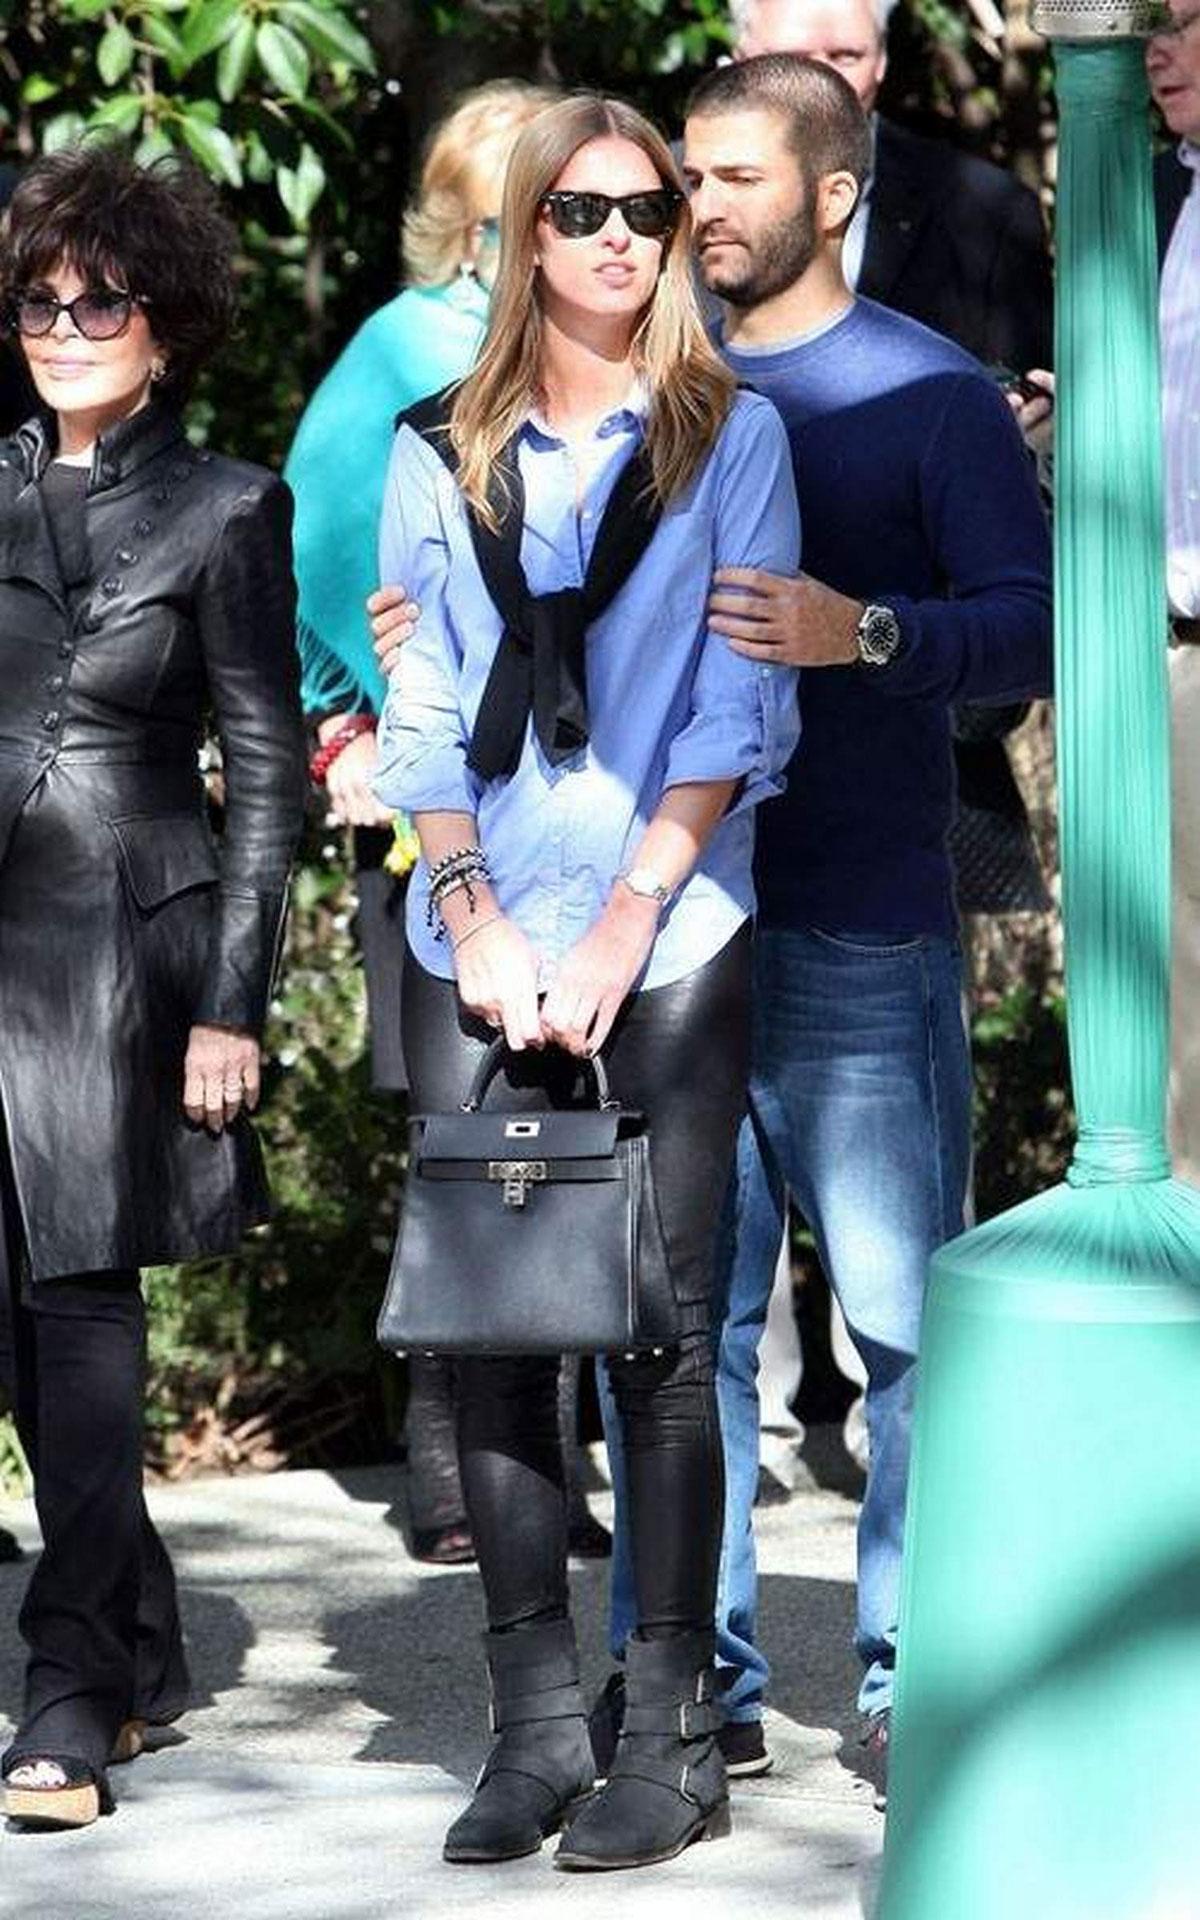 Nicky Hilton arrives at the Pre-Oscar Party